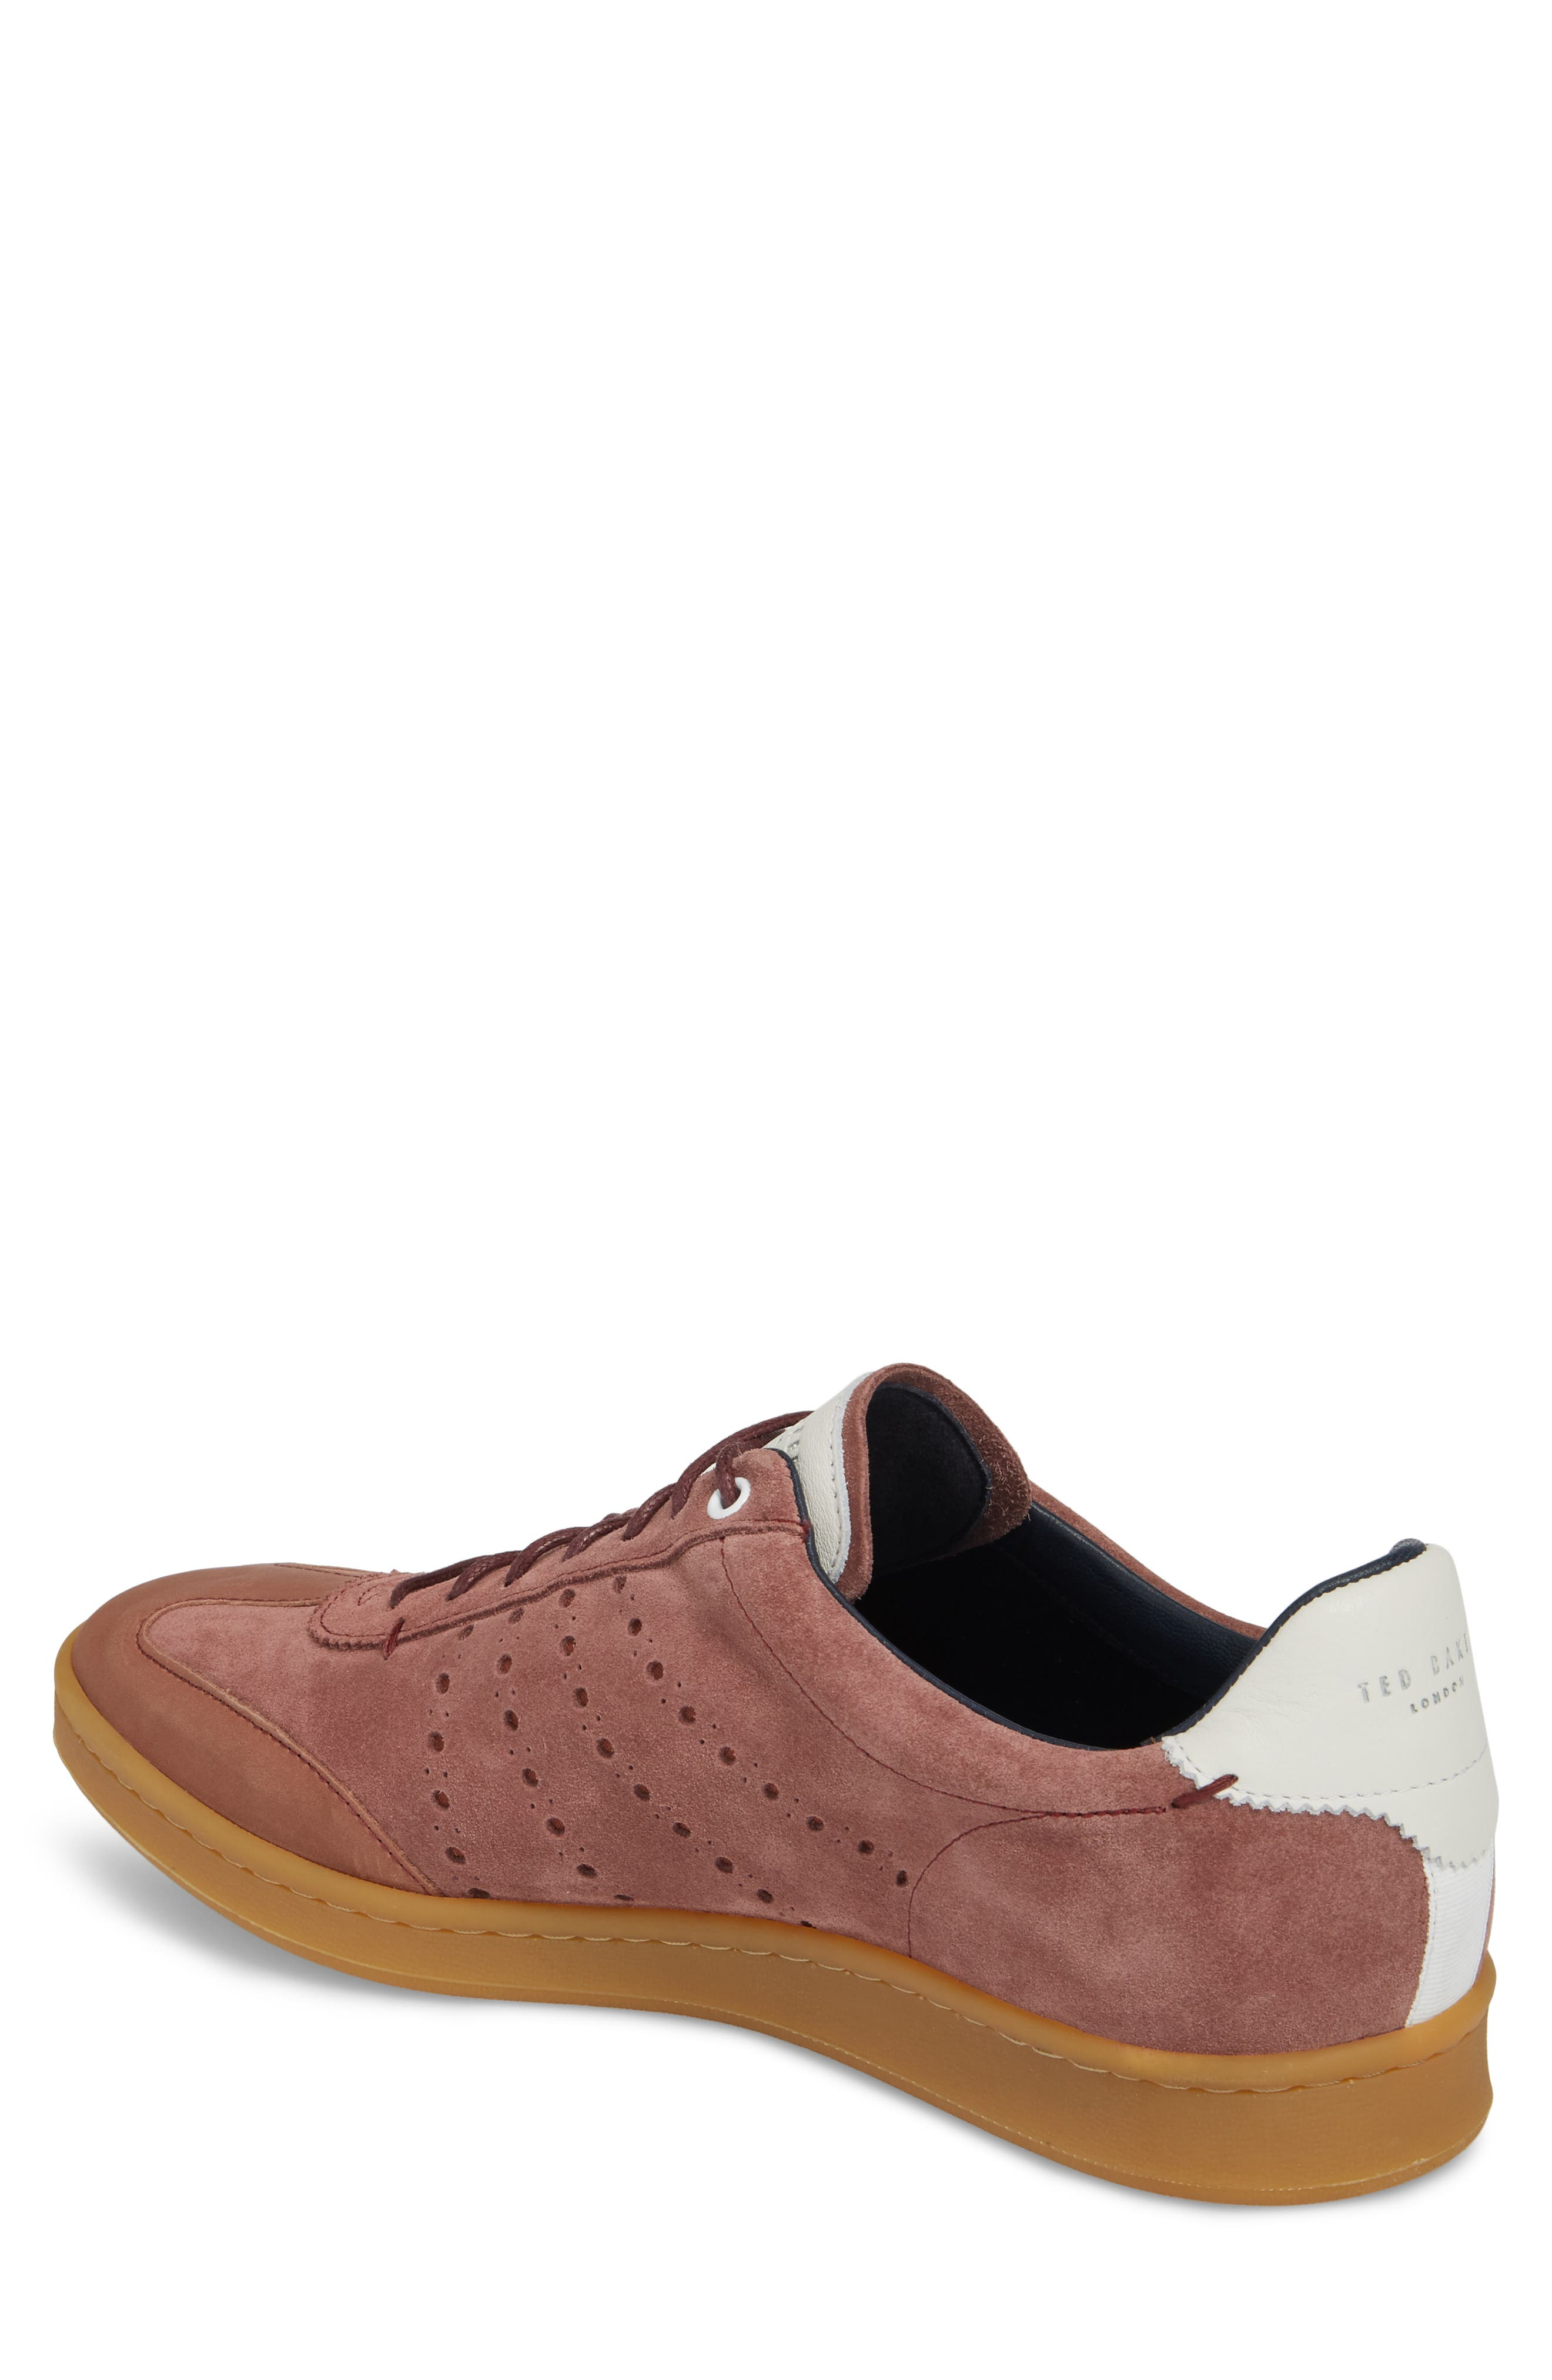 Orlees Low Top Sneaker,                             Alternate thumbnail 4, color,